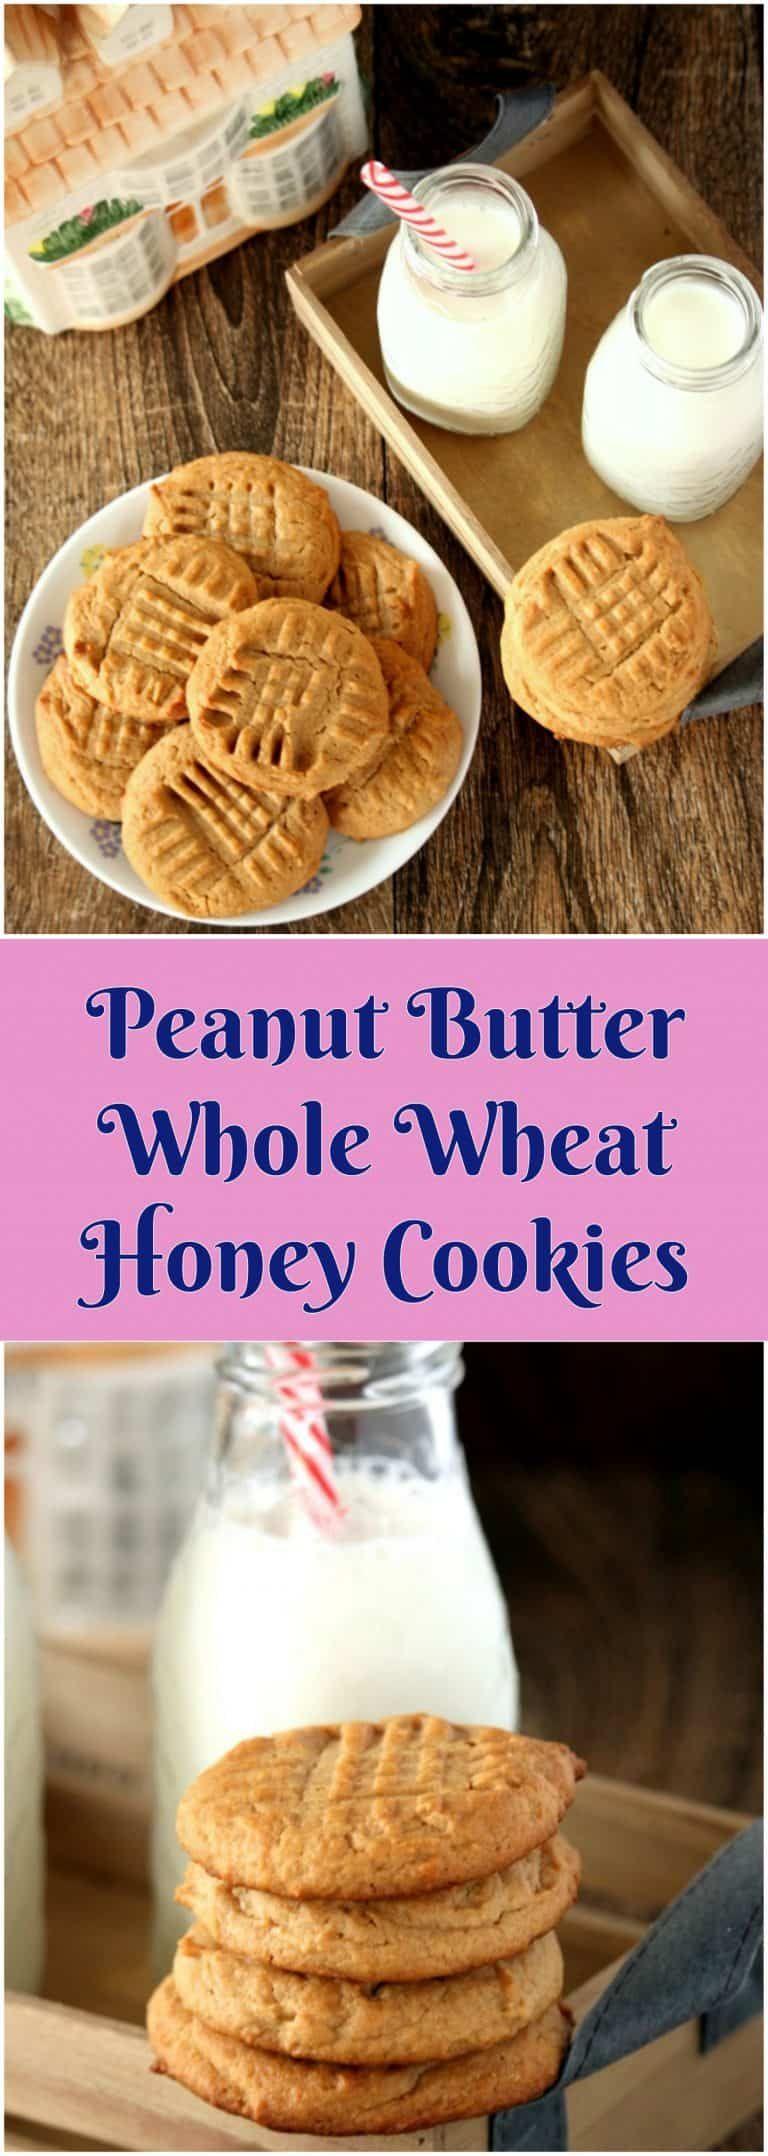 Peanut butter whole wheat honey cookies honey cookies